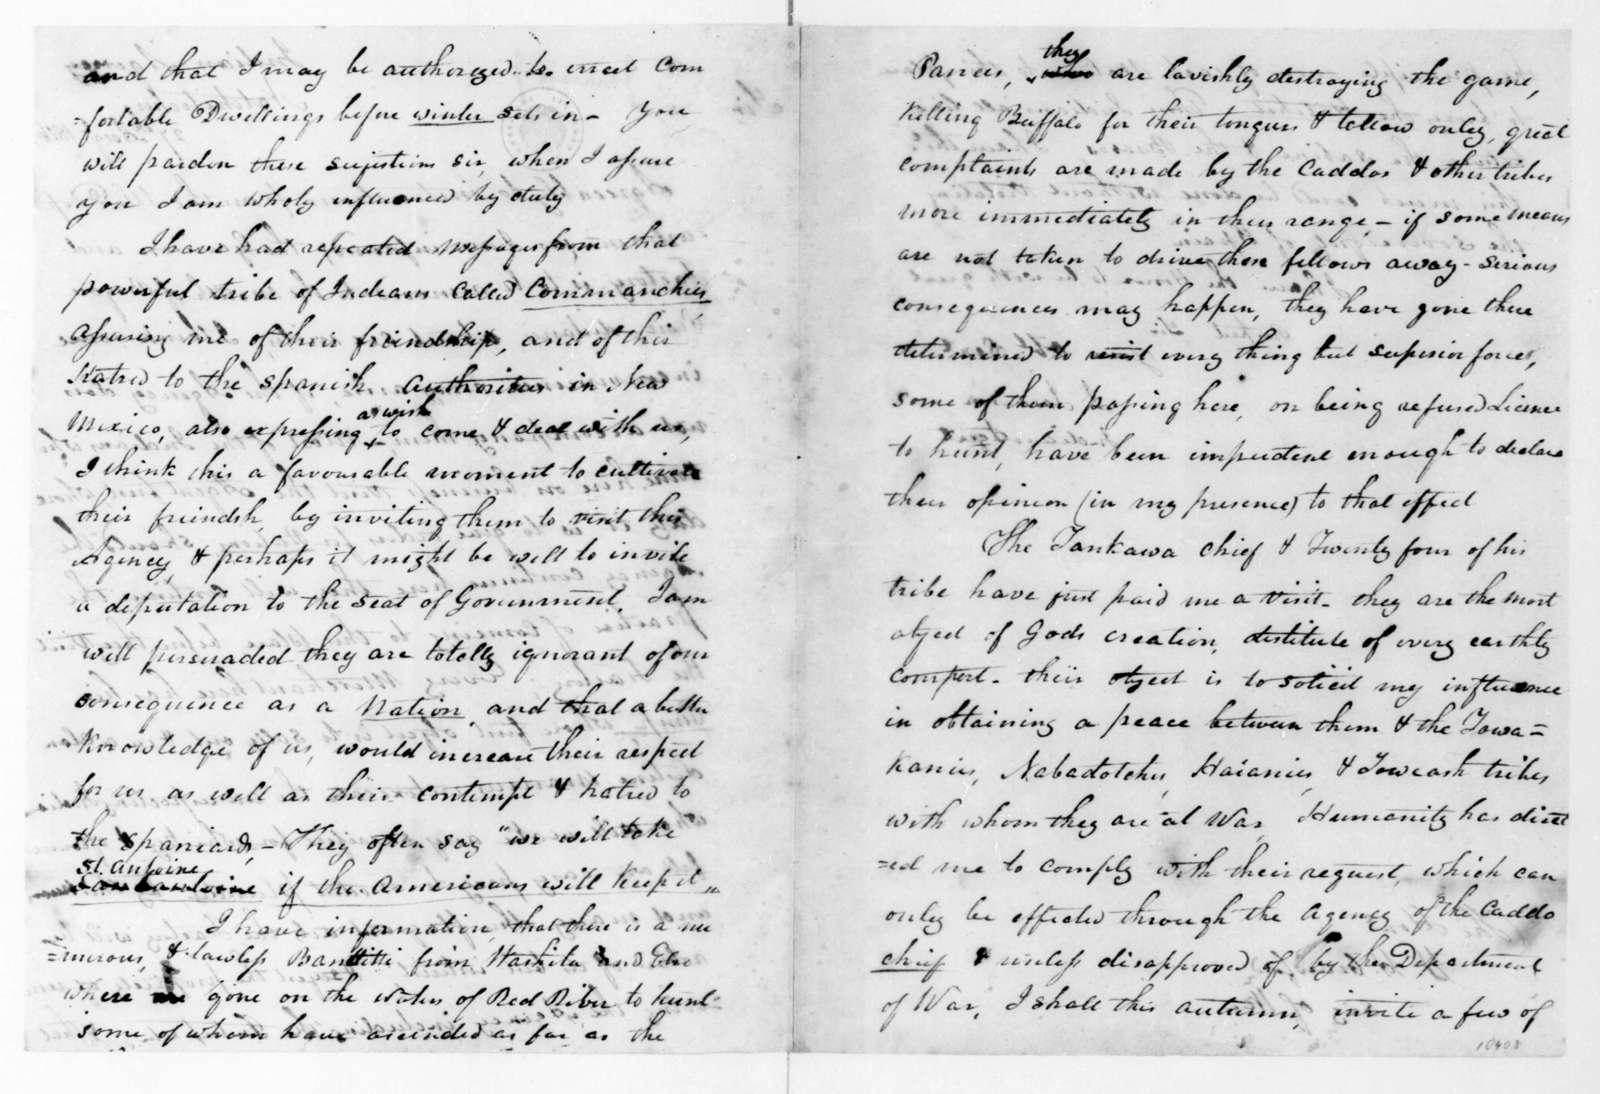 J. Jamison to William H. Crawford, August 27, 1816.